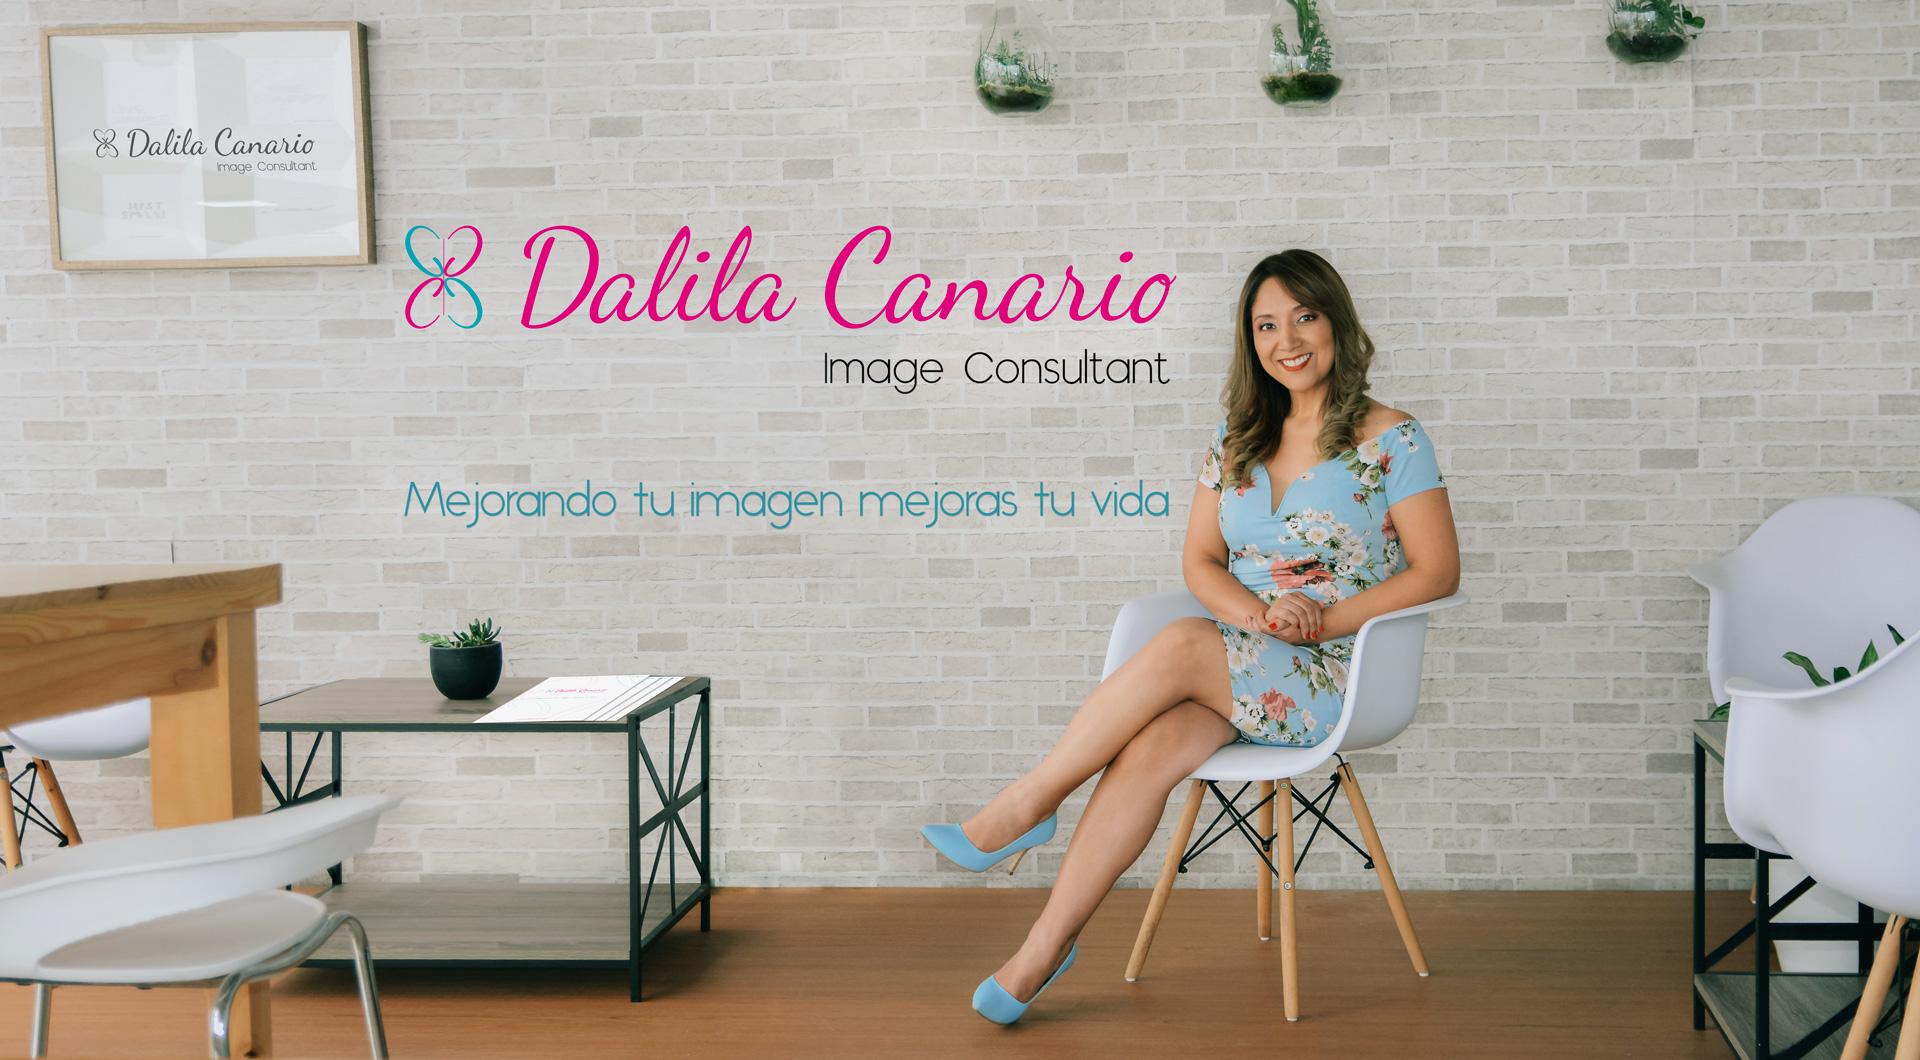 DALILA CANARIO Image Consultant Header